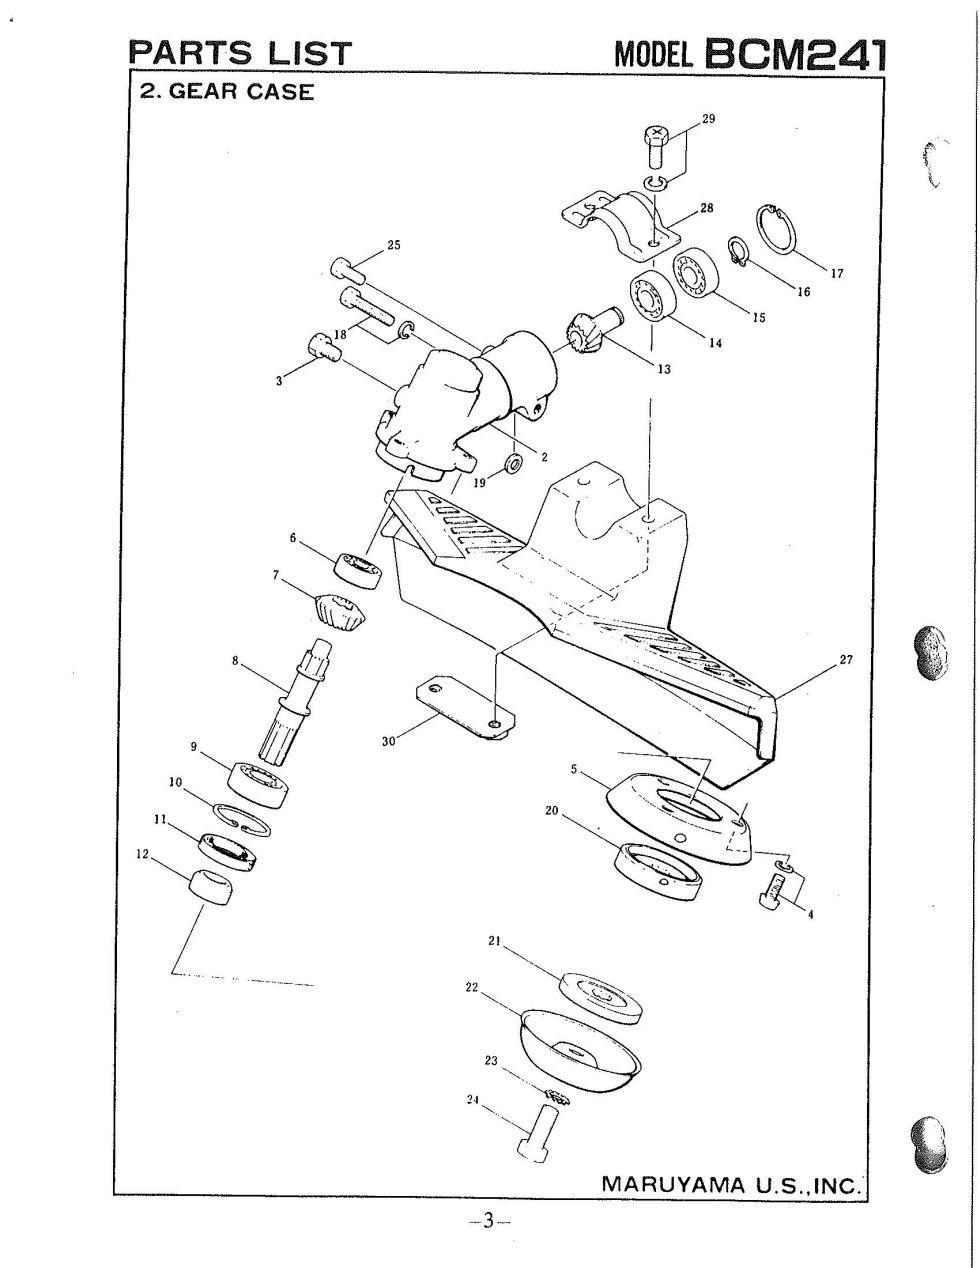 Maruyama Parts Lookup - BCM241 Parts Diagrams BCM241 Gearcase